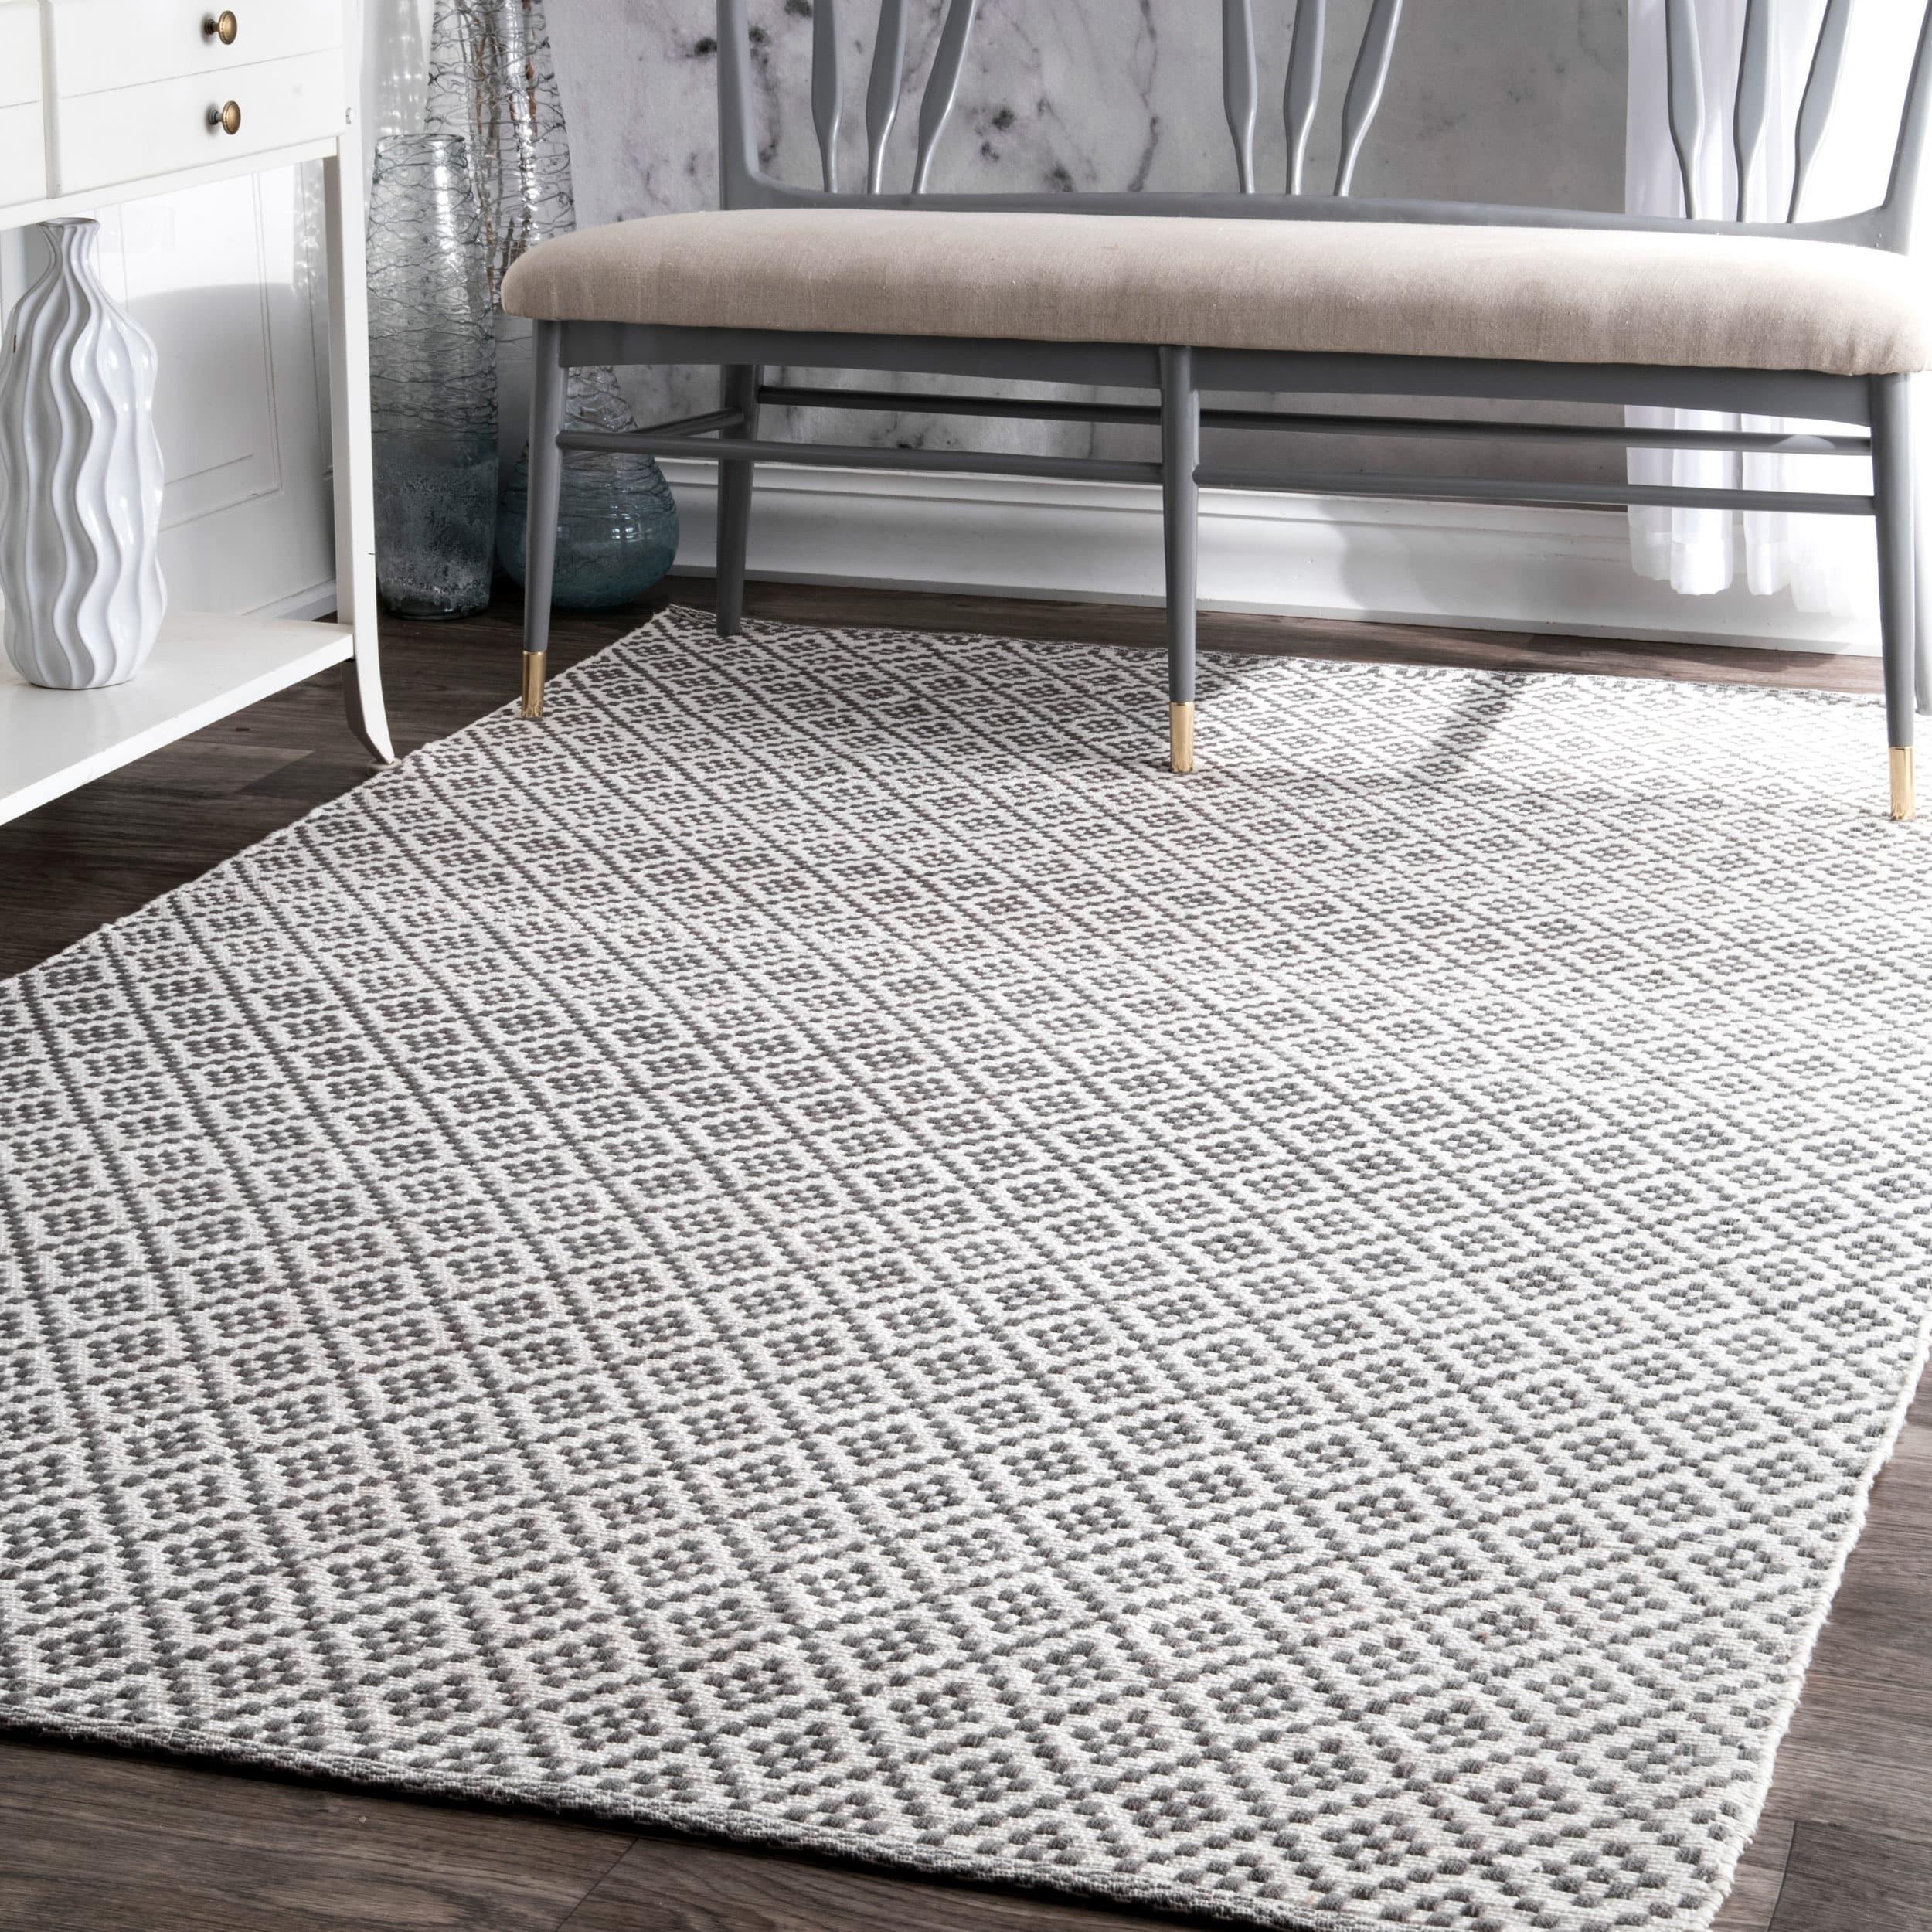 nuLOOM Handmade Flatweave Moroccan Trellis Cotton Rug 5 x 8